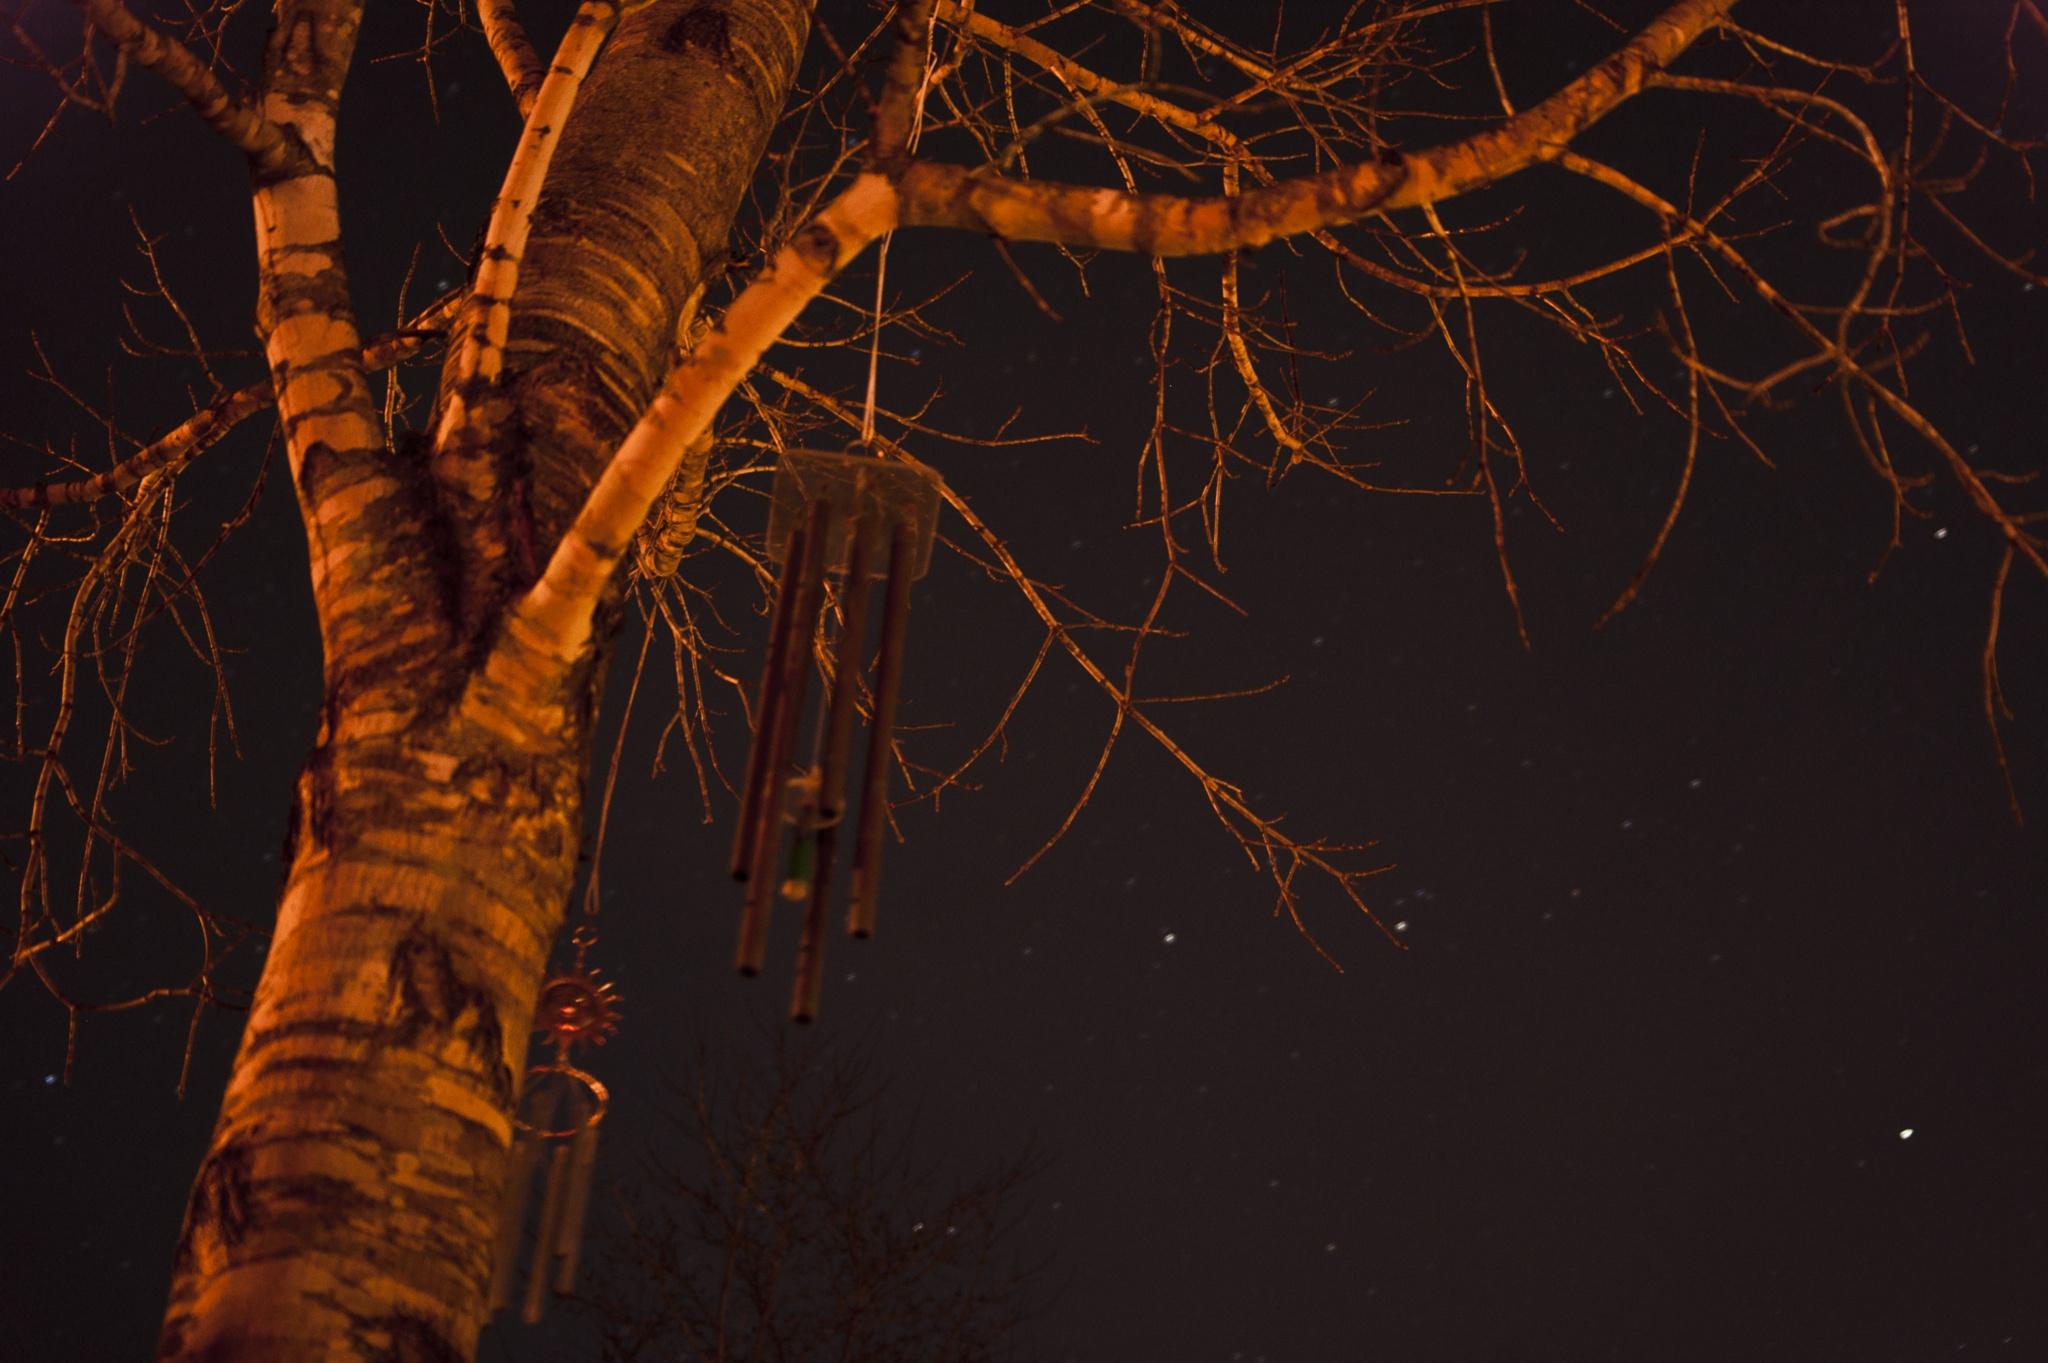 Wind chimes by Austin Devine